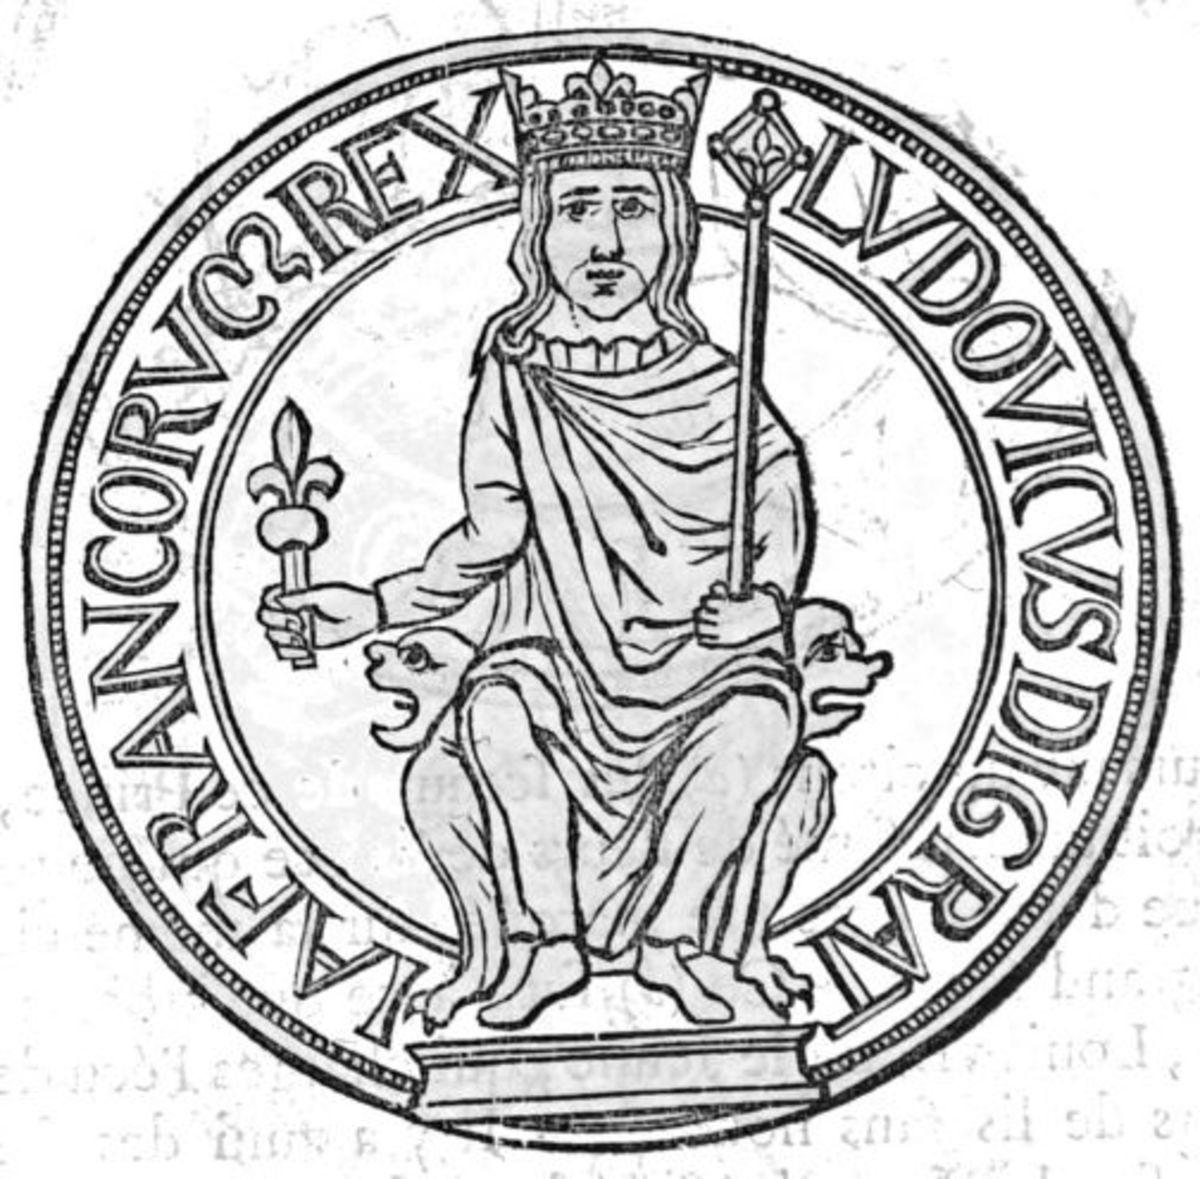 Louis VII of France's royal seal.